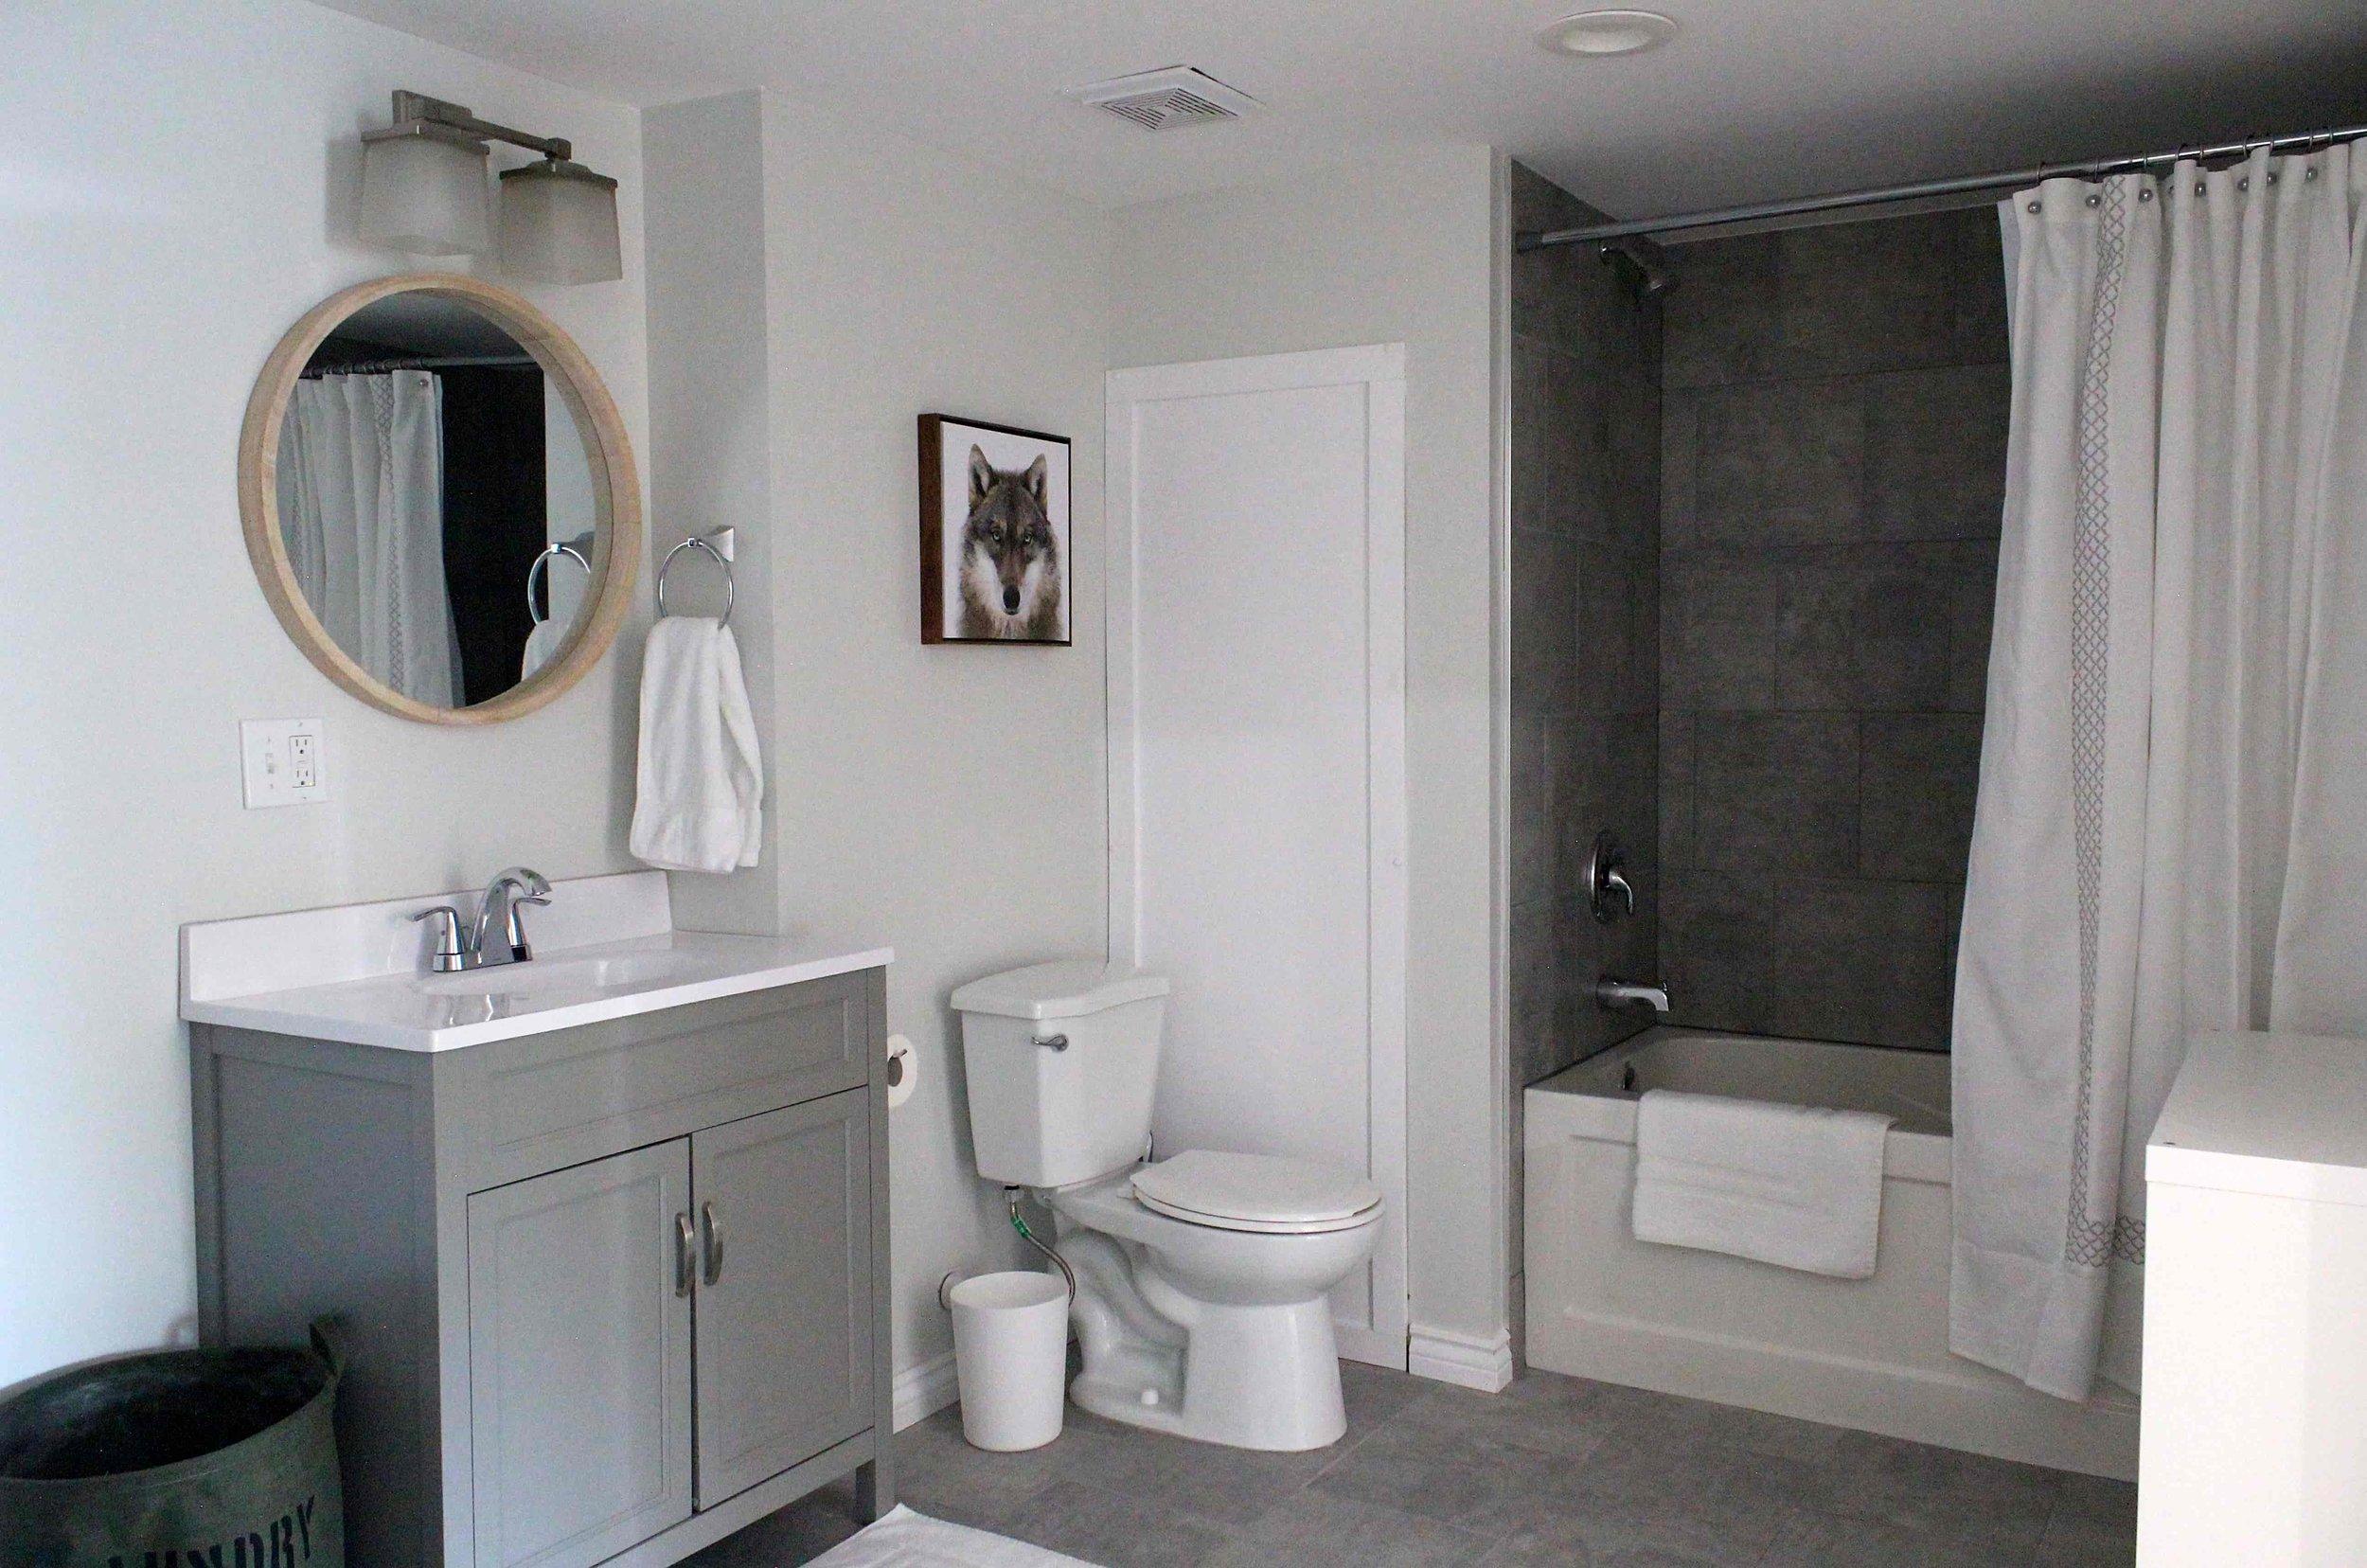 06 Bathroom - Shower-min.jpg